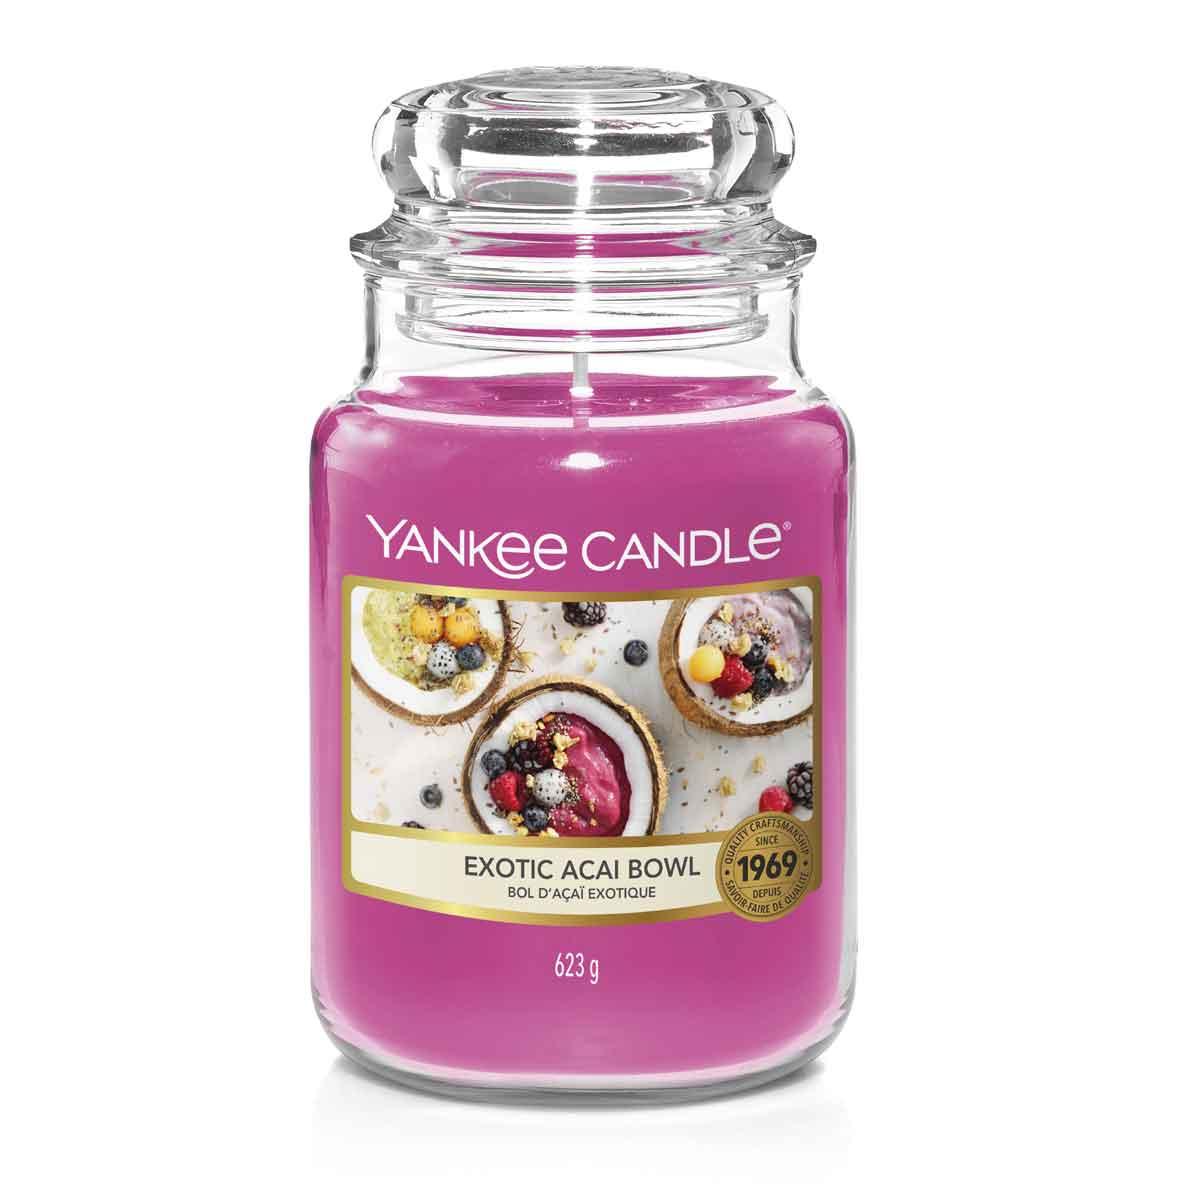 Yankee Candle Exotic Acai Bowl Giara Grande